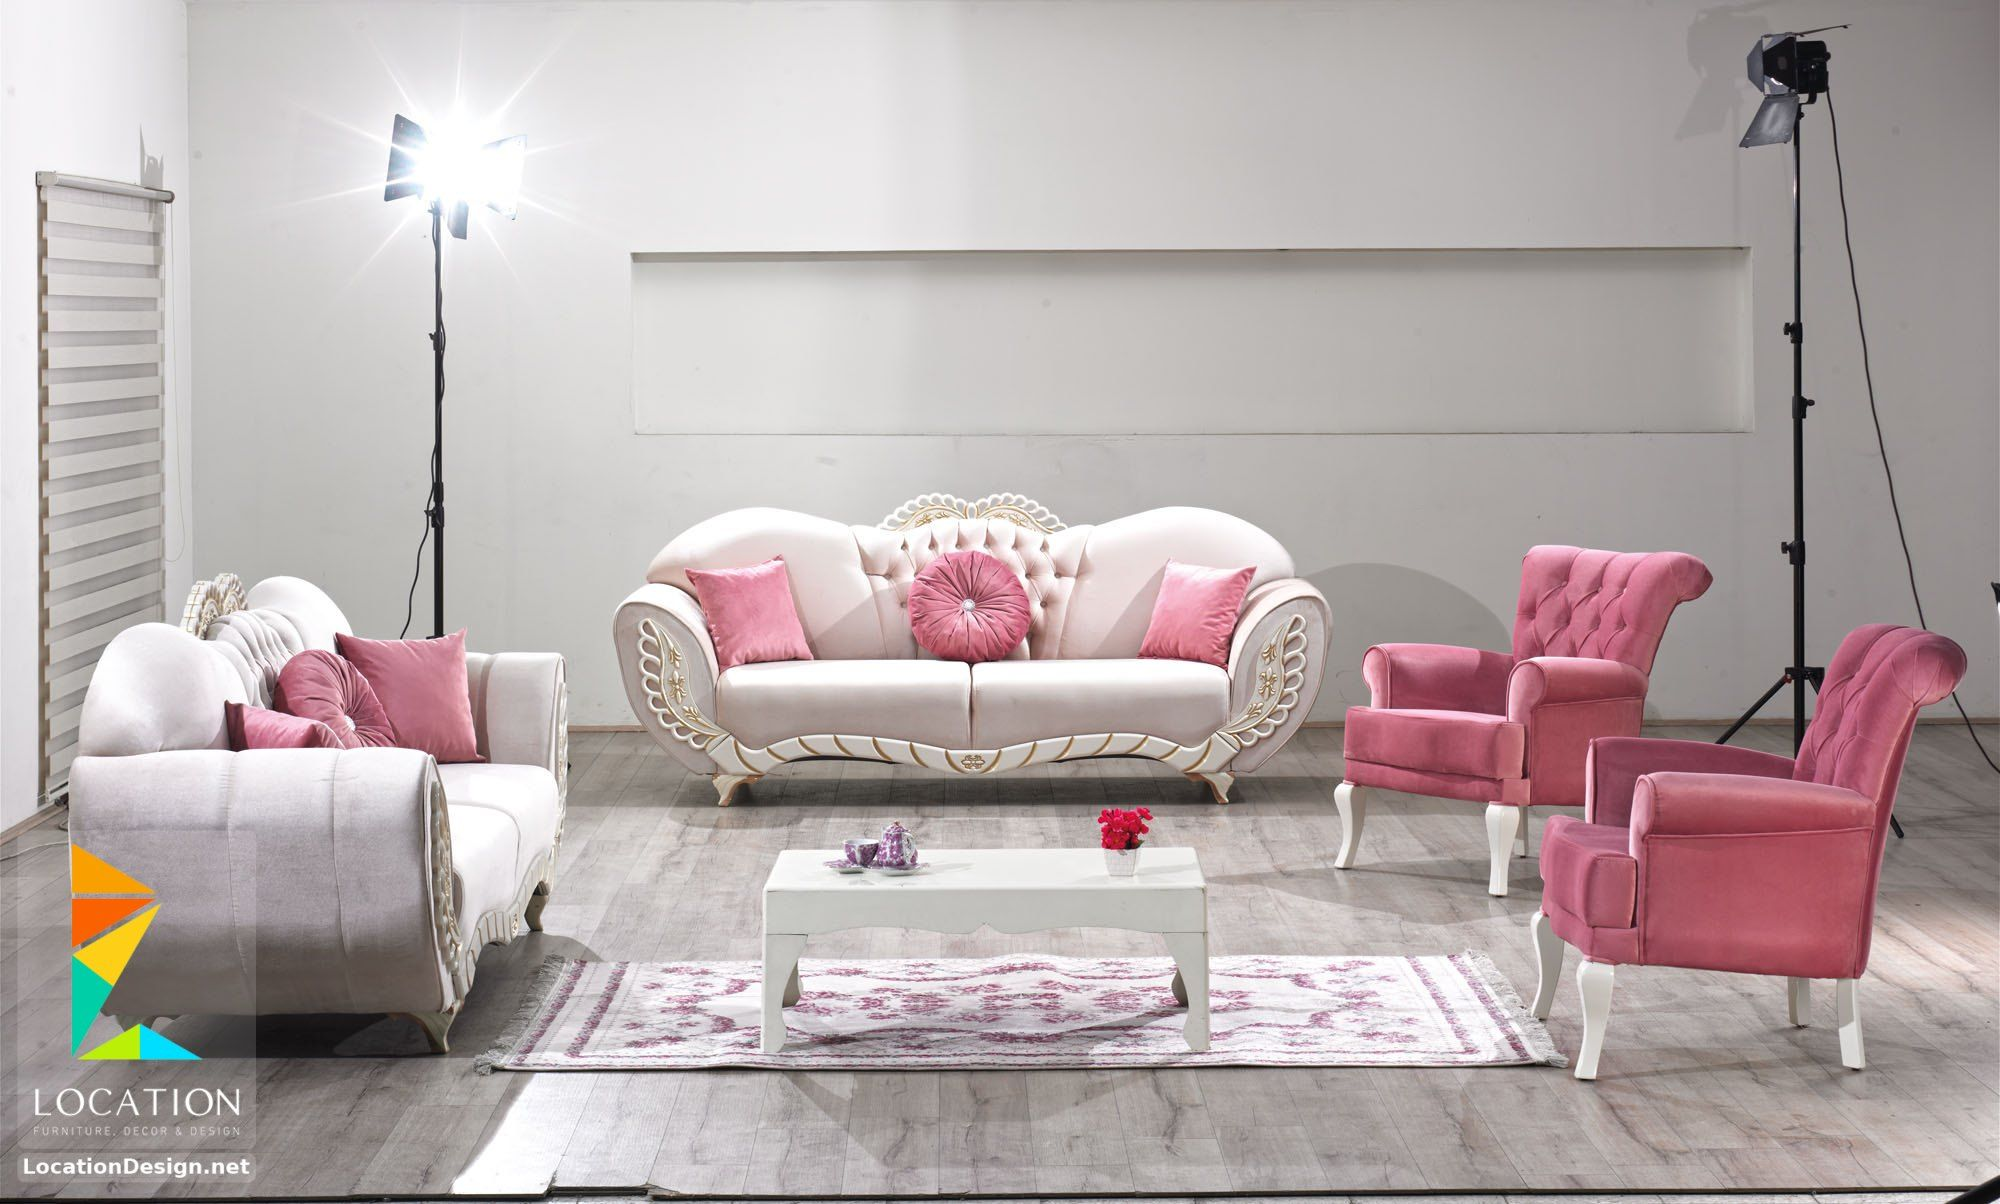 احدث كتالوج صور انتريهات وصالونات وركن مودرن وستيل Living Room Sofa Design Living Room Styles Modern Bedroom Interior